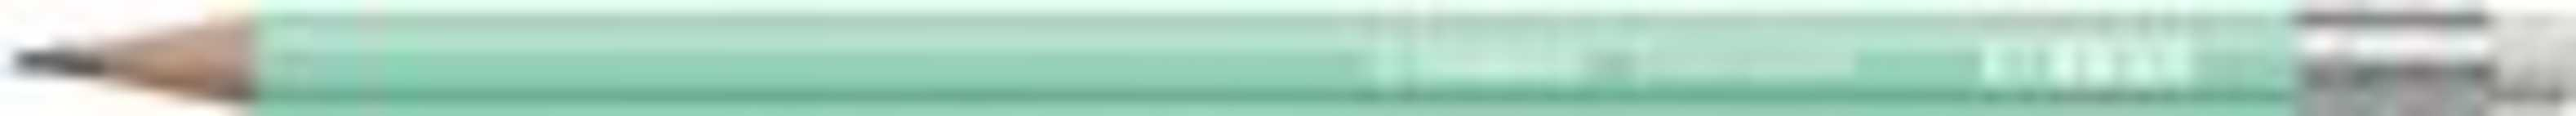 Stabilo potlood Swano pastel, groen, met gom